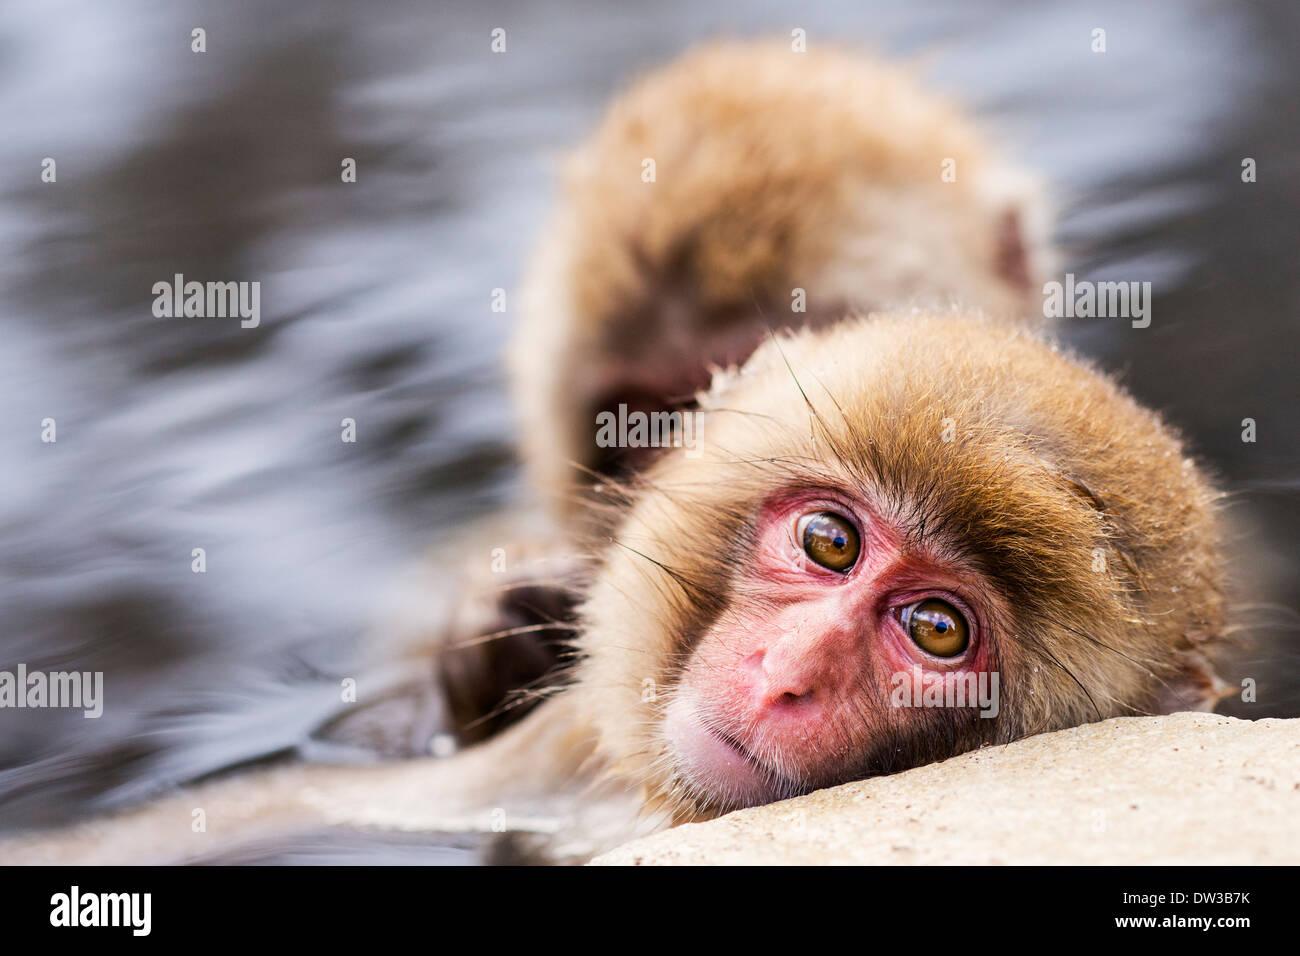 Japanese Snow Monkeys in Nagano, Japan. Stock Photo